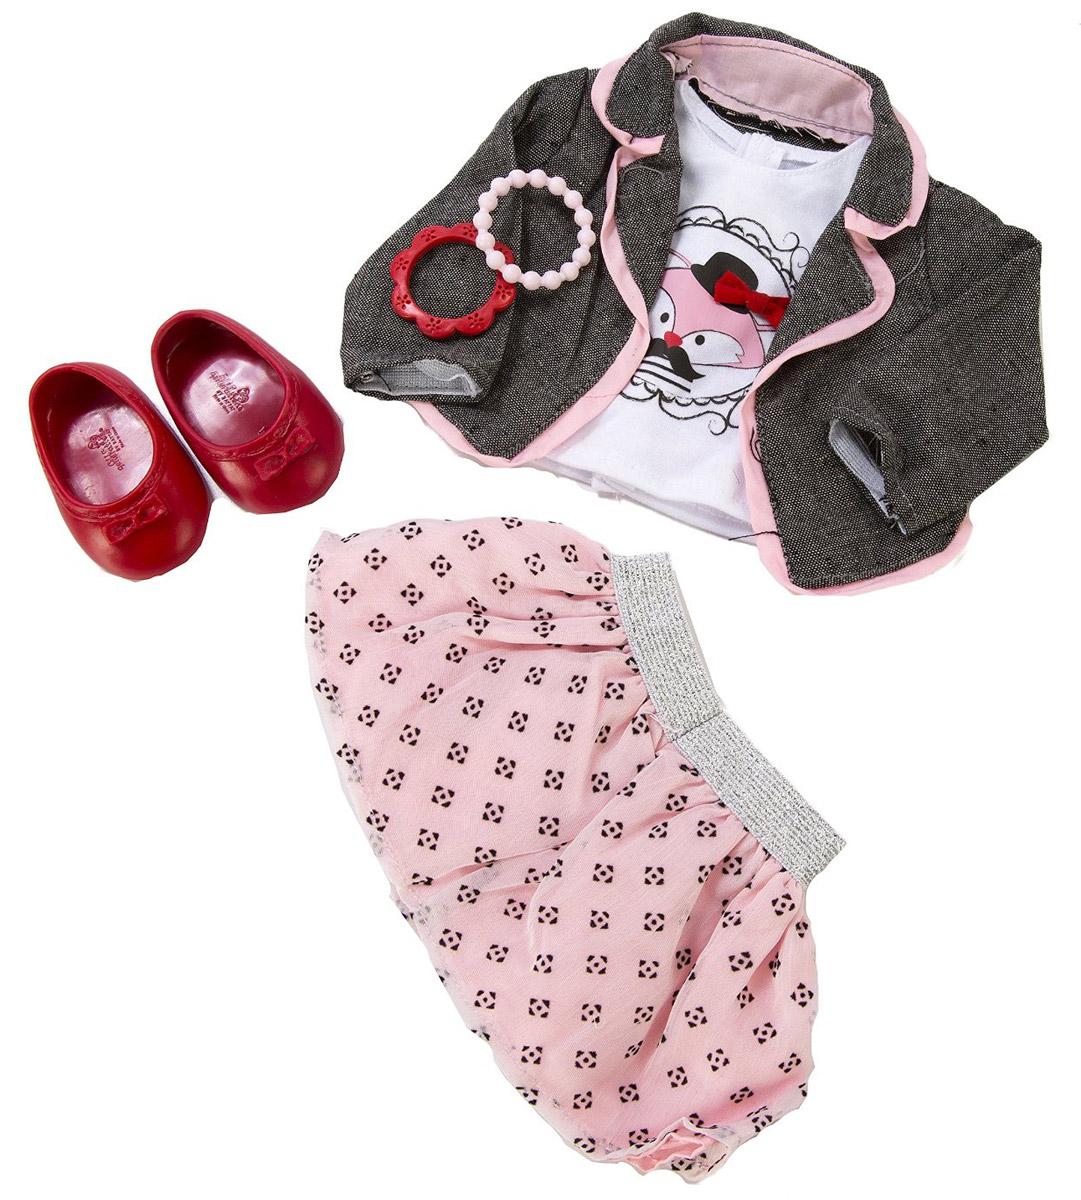 Our Generation Одежда для кукол Жакет майка с рисунком юбка балетки 11576